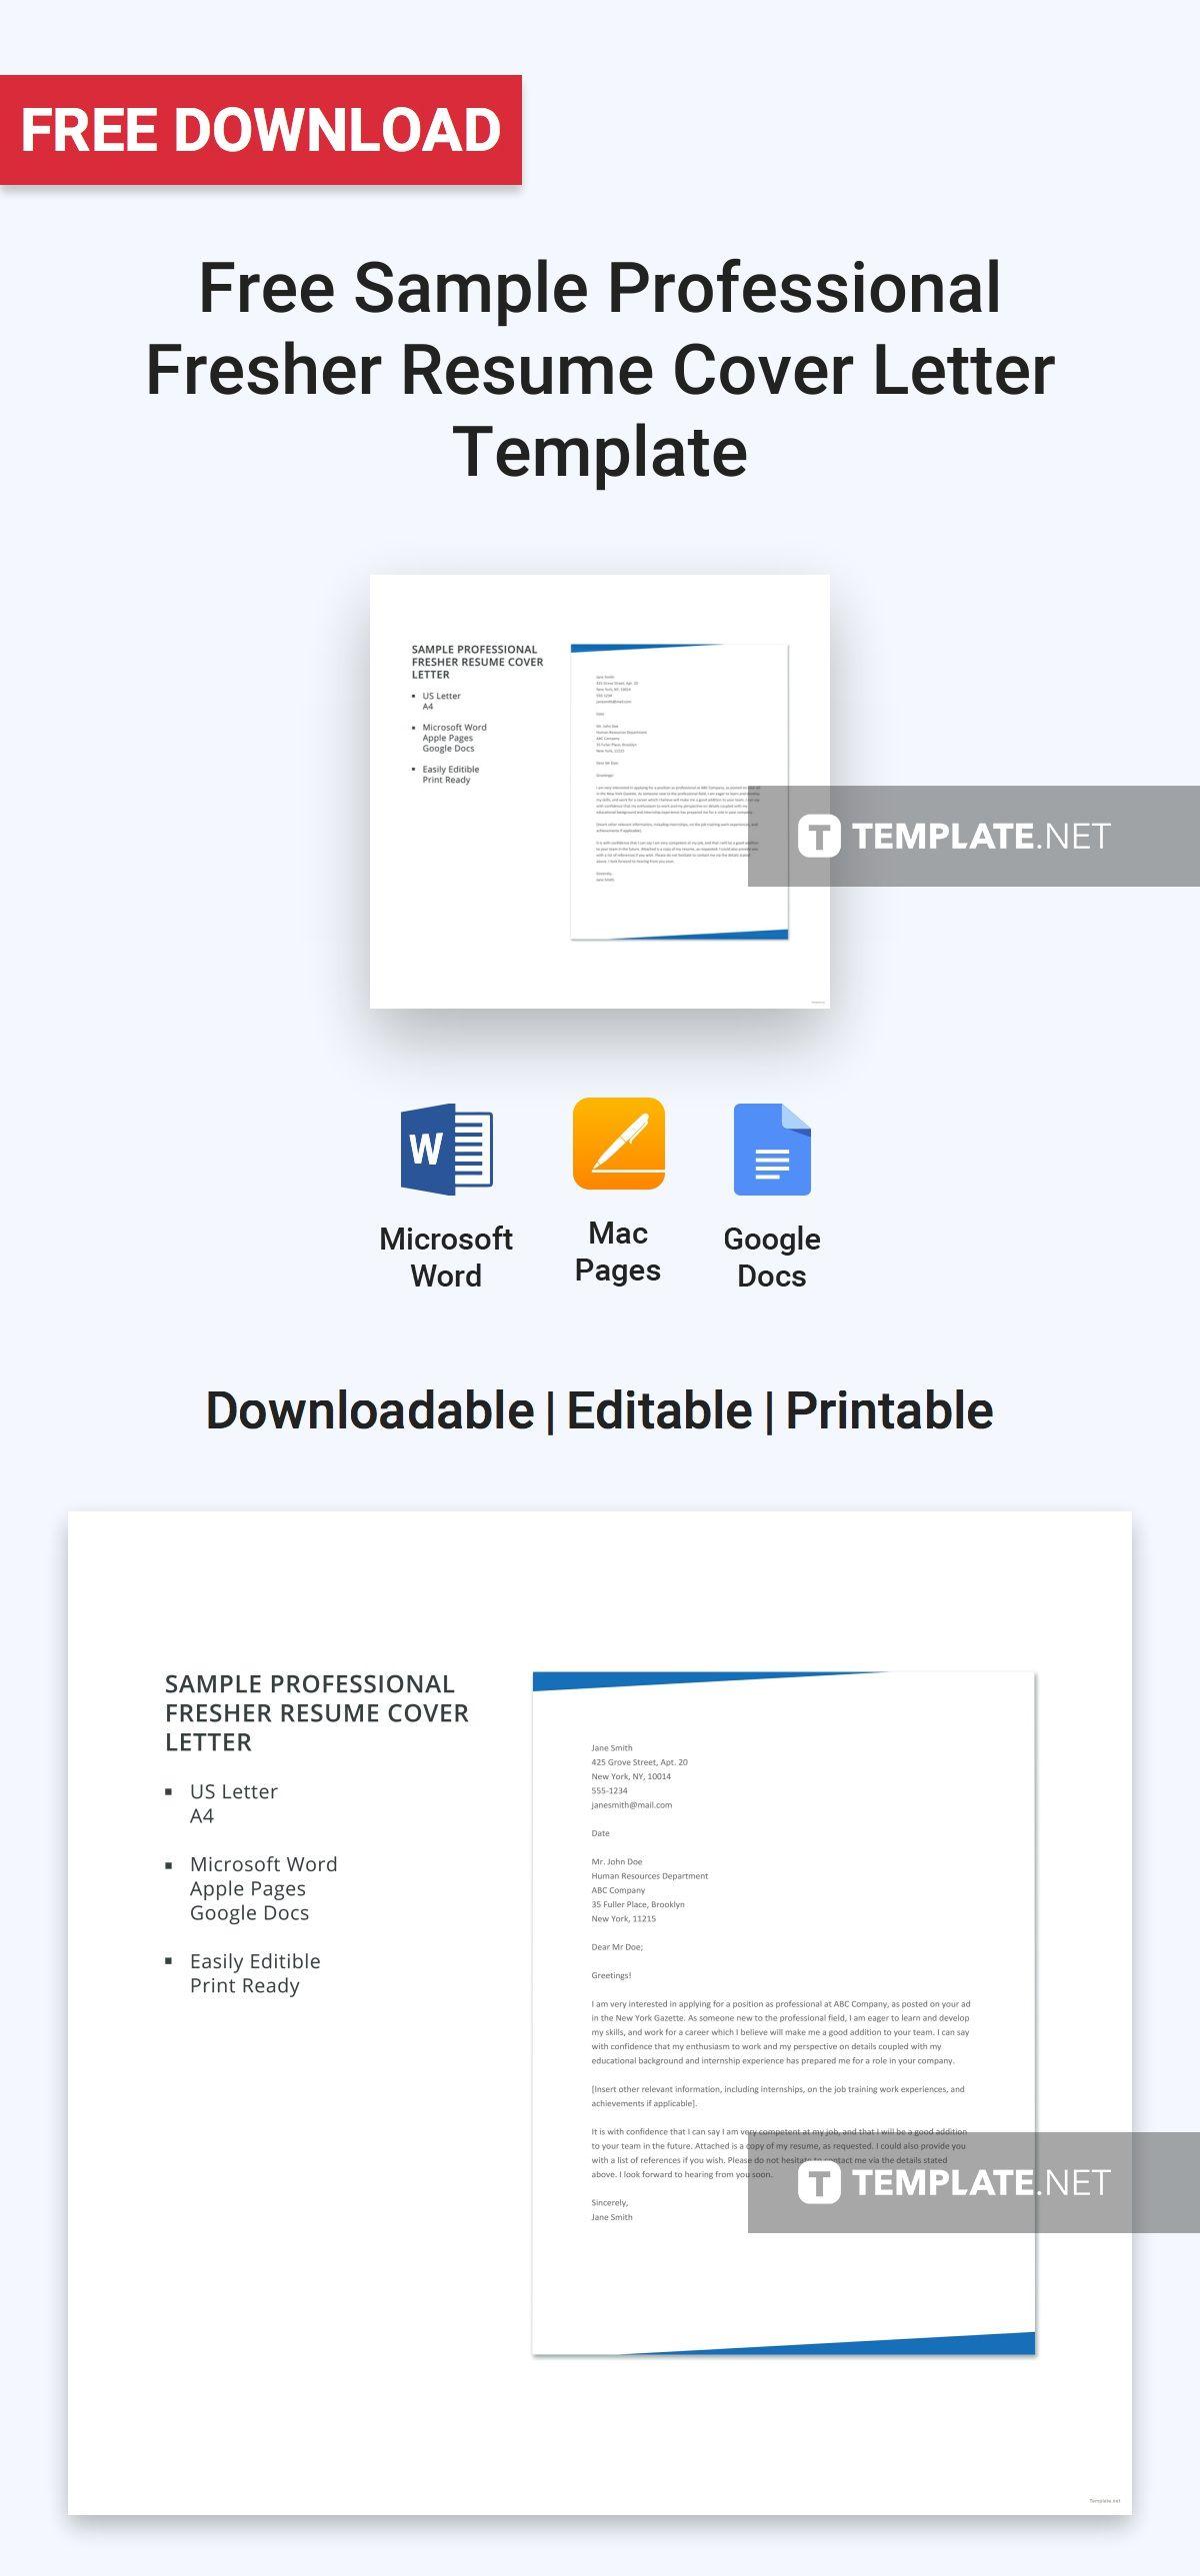 Free Sample Professional Fresher Resume Cover Letter Resume